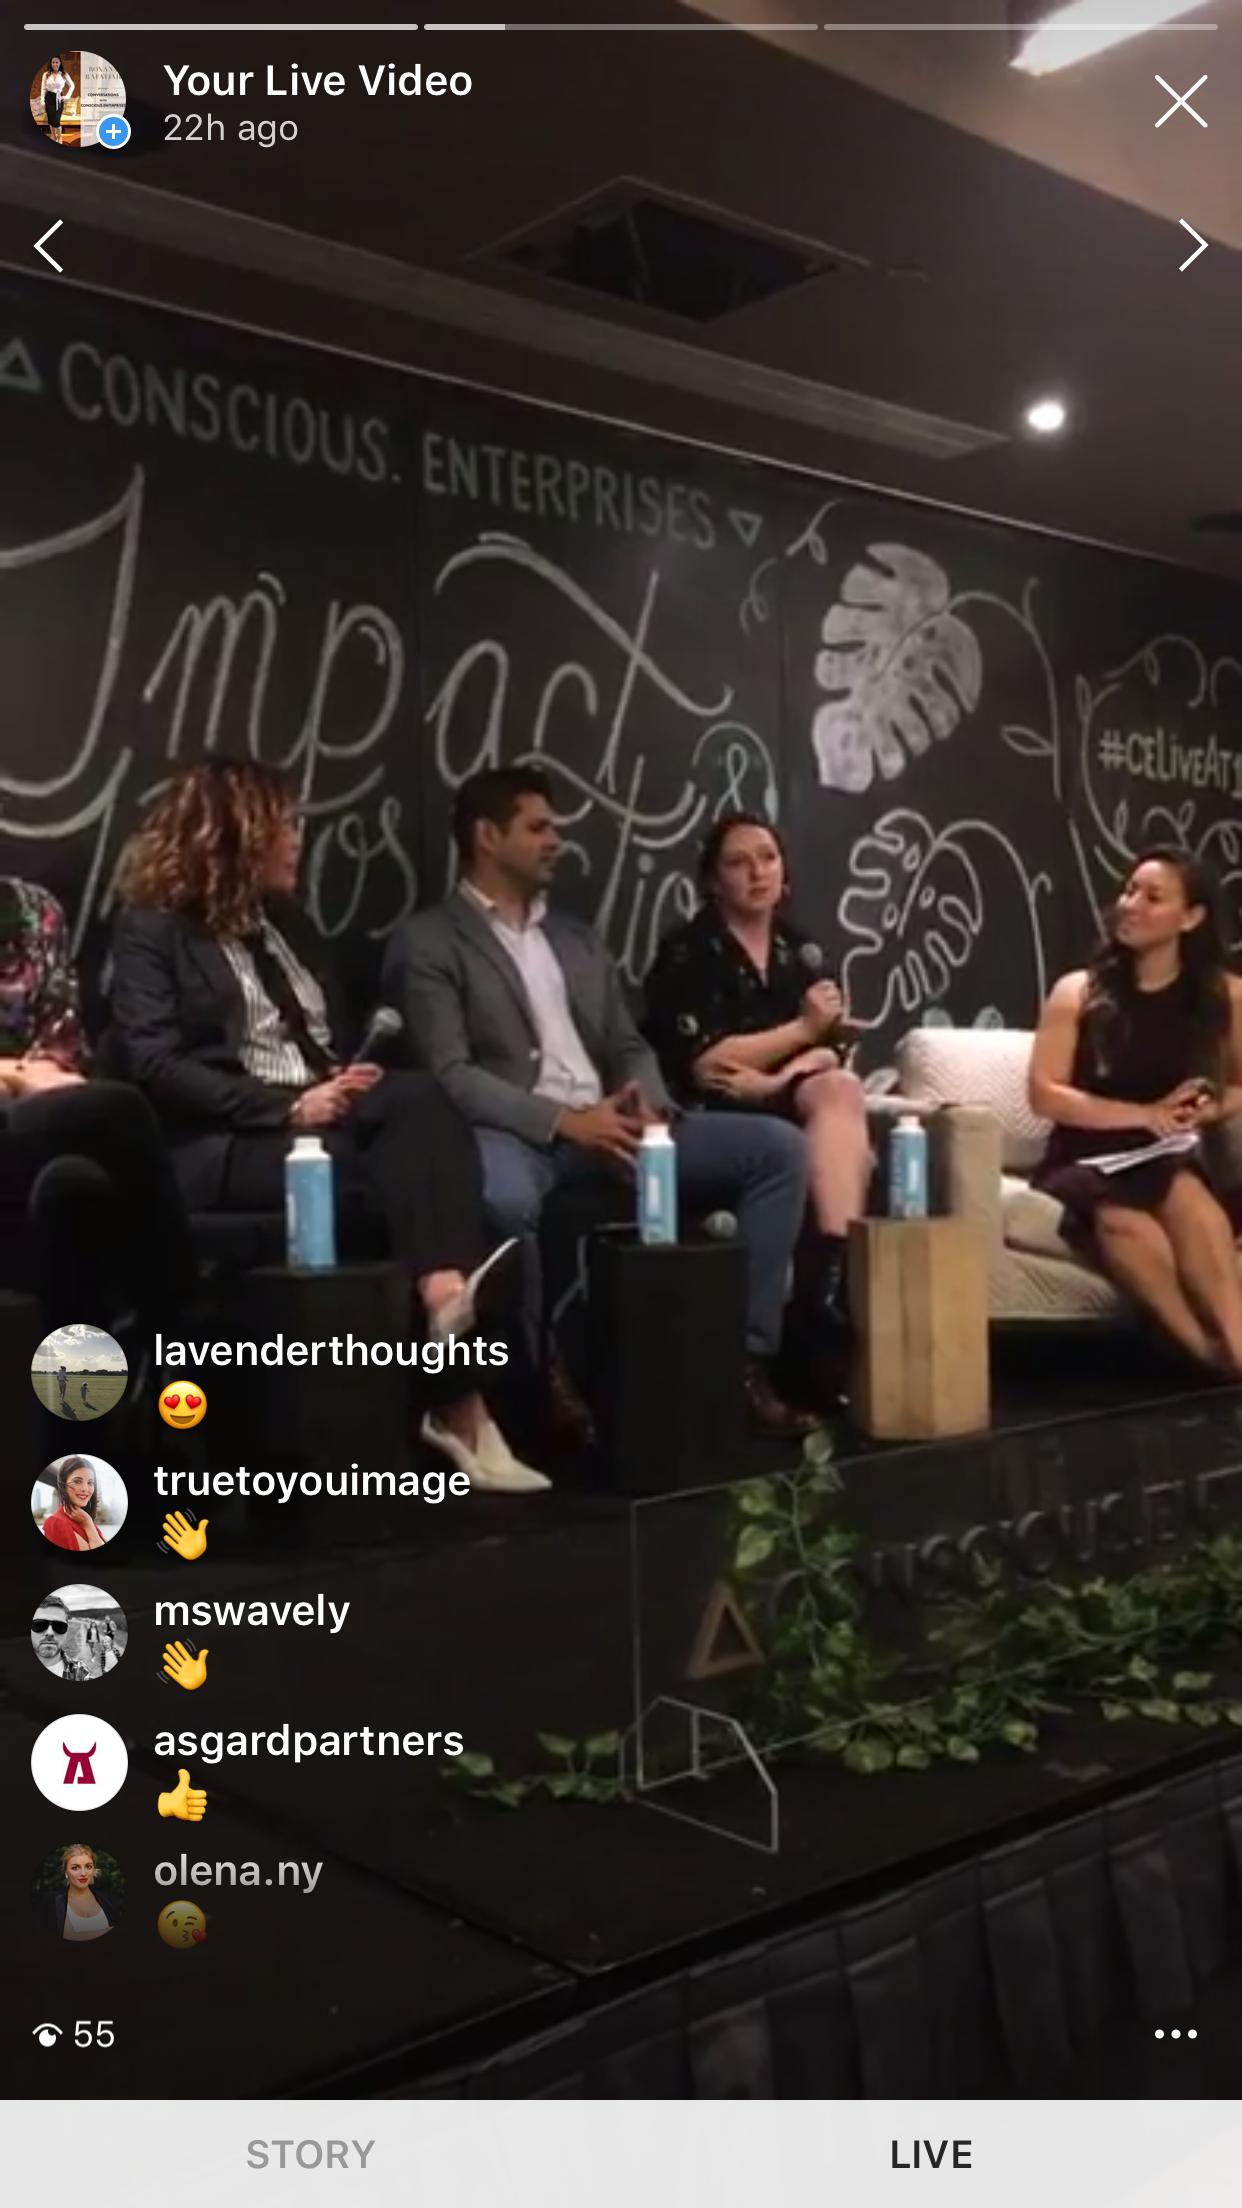 Instagram Live Feed of Conscious Enterprises LIVE @ 1 Hotel